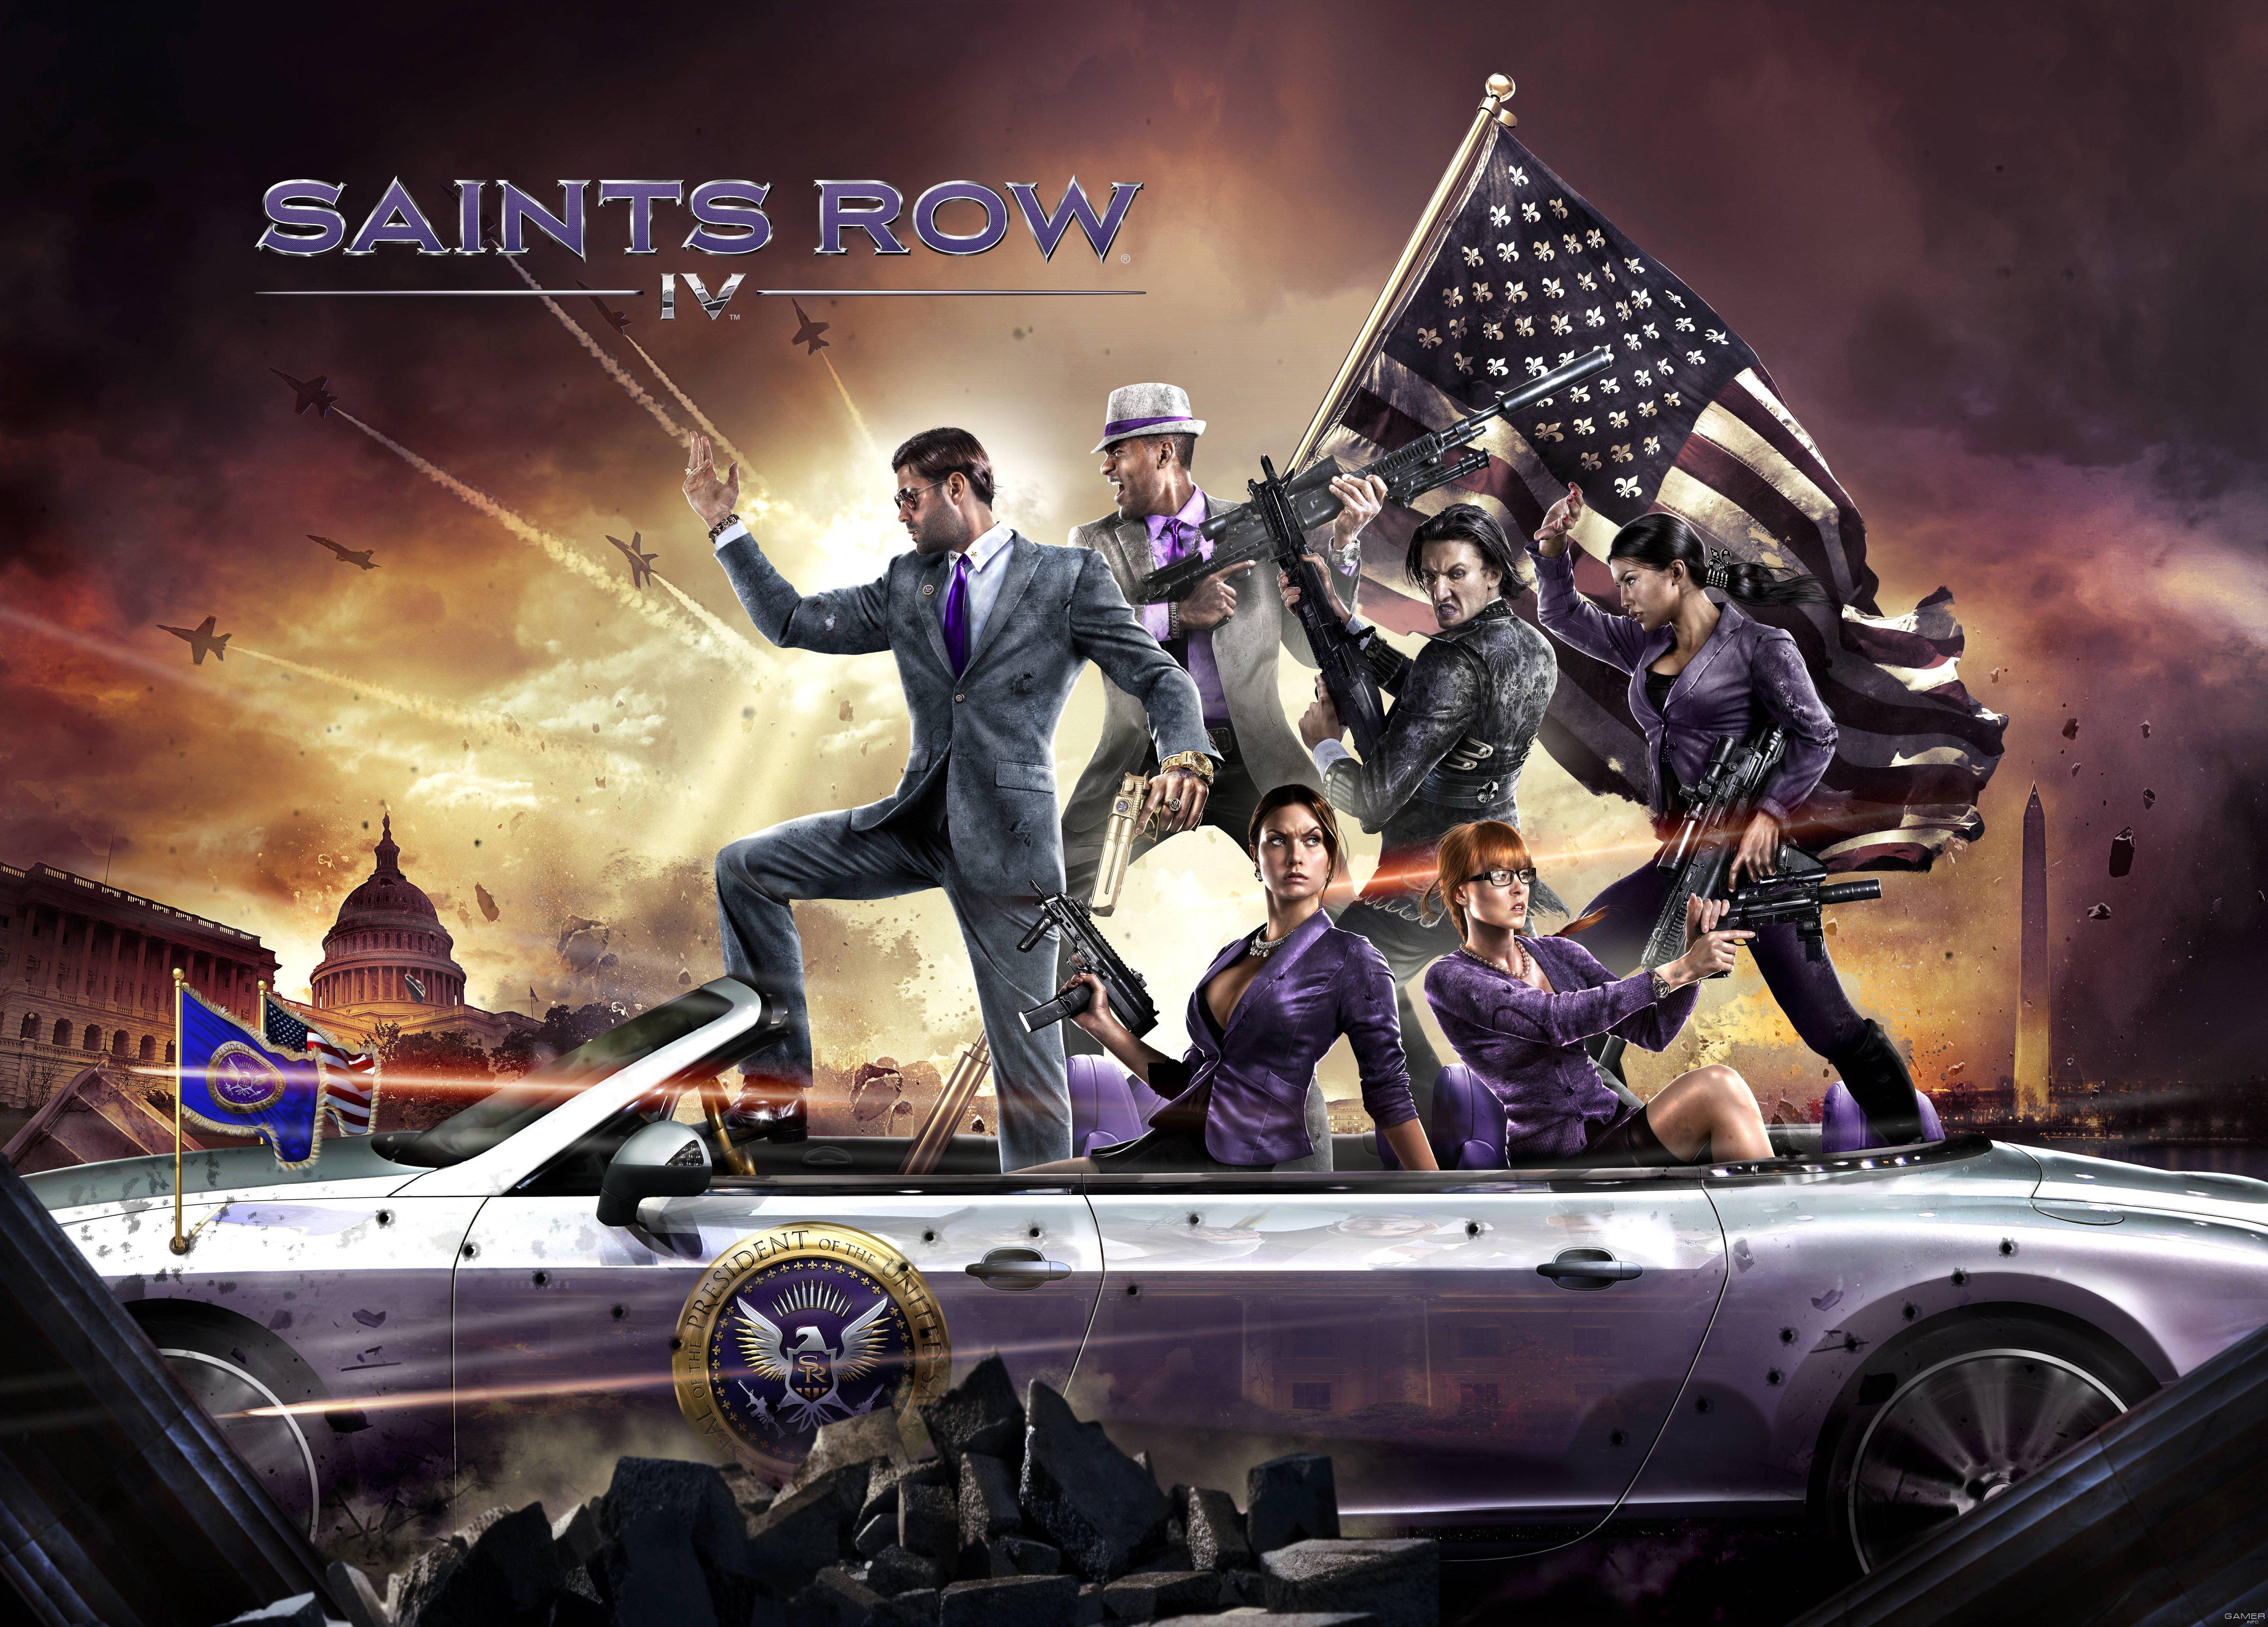 Saints Row IV by Eli Morgan